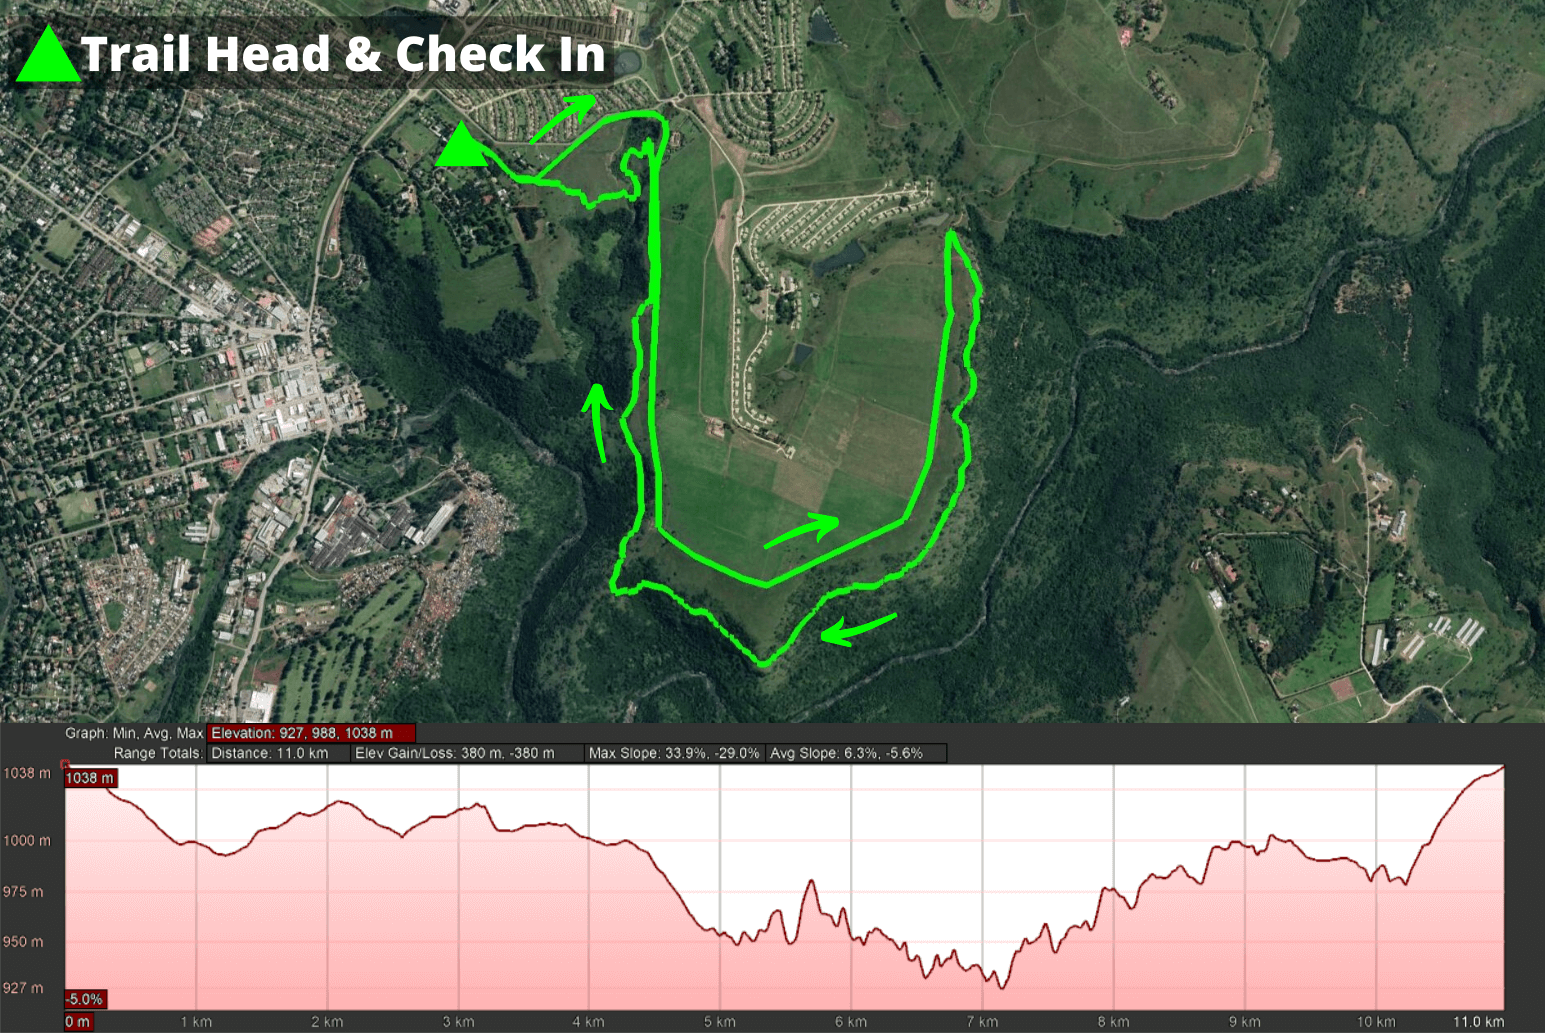 KZNTR WESSA uMngeni Trail Jun20 - 11km Course (Directioned) 2020-06-26 V1